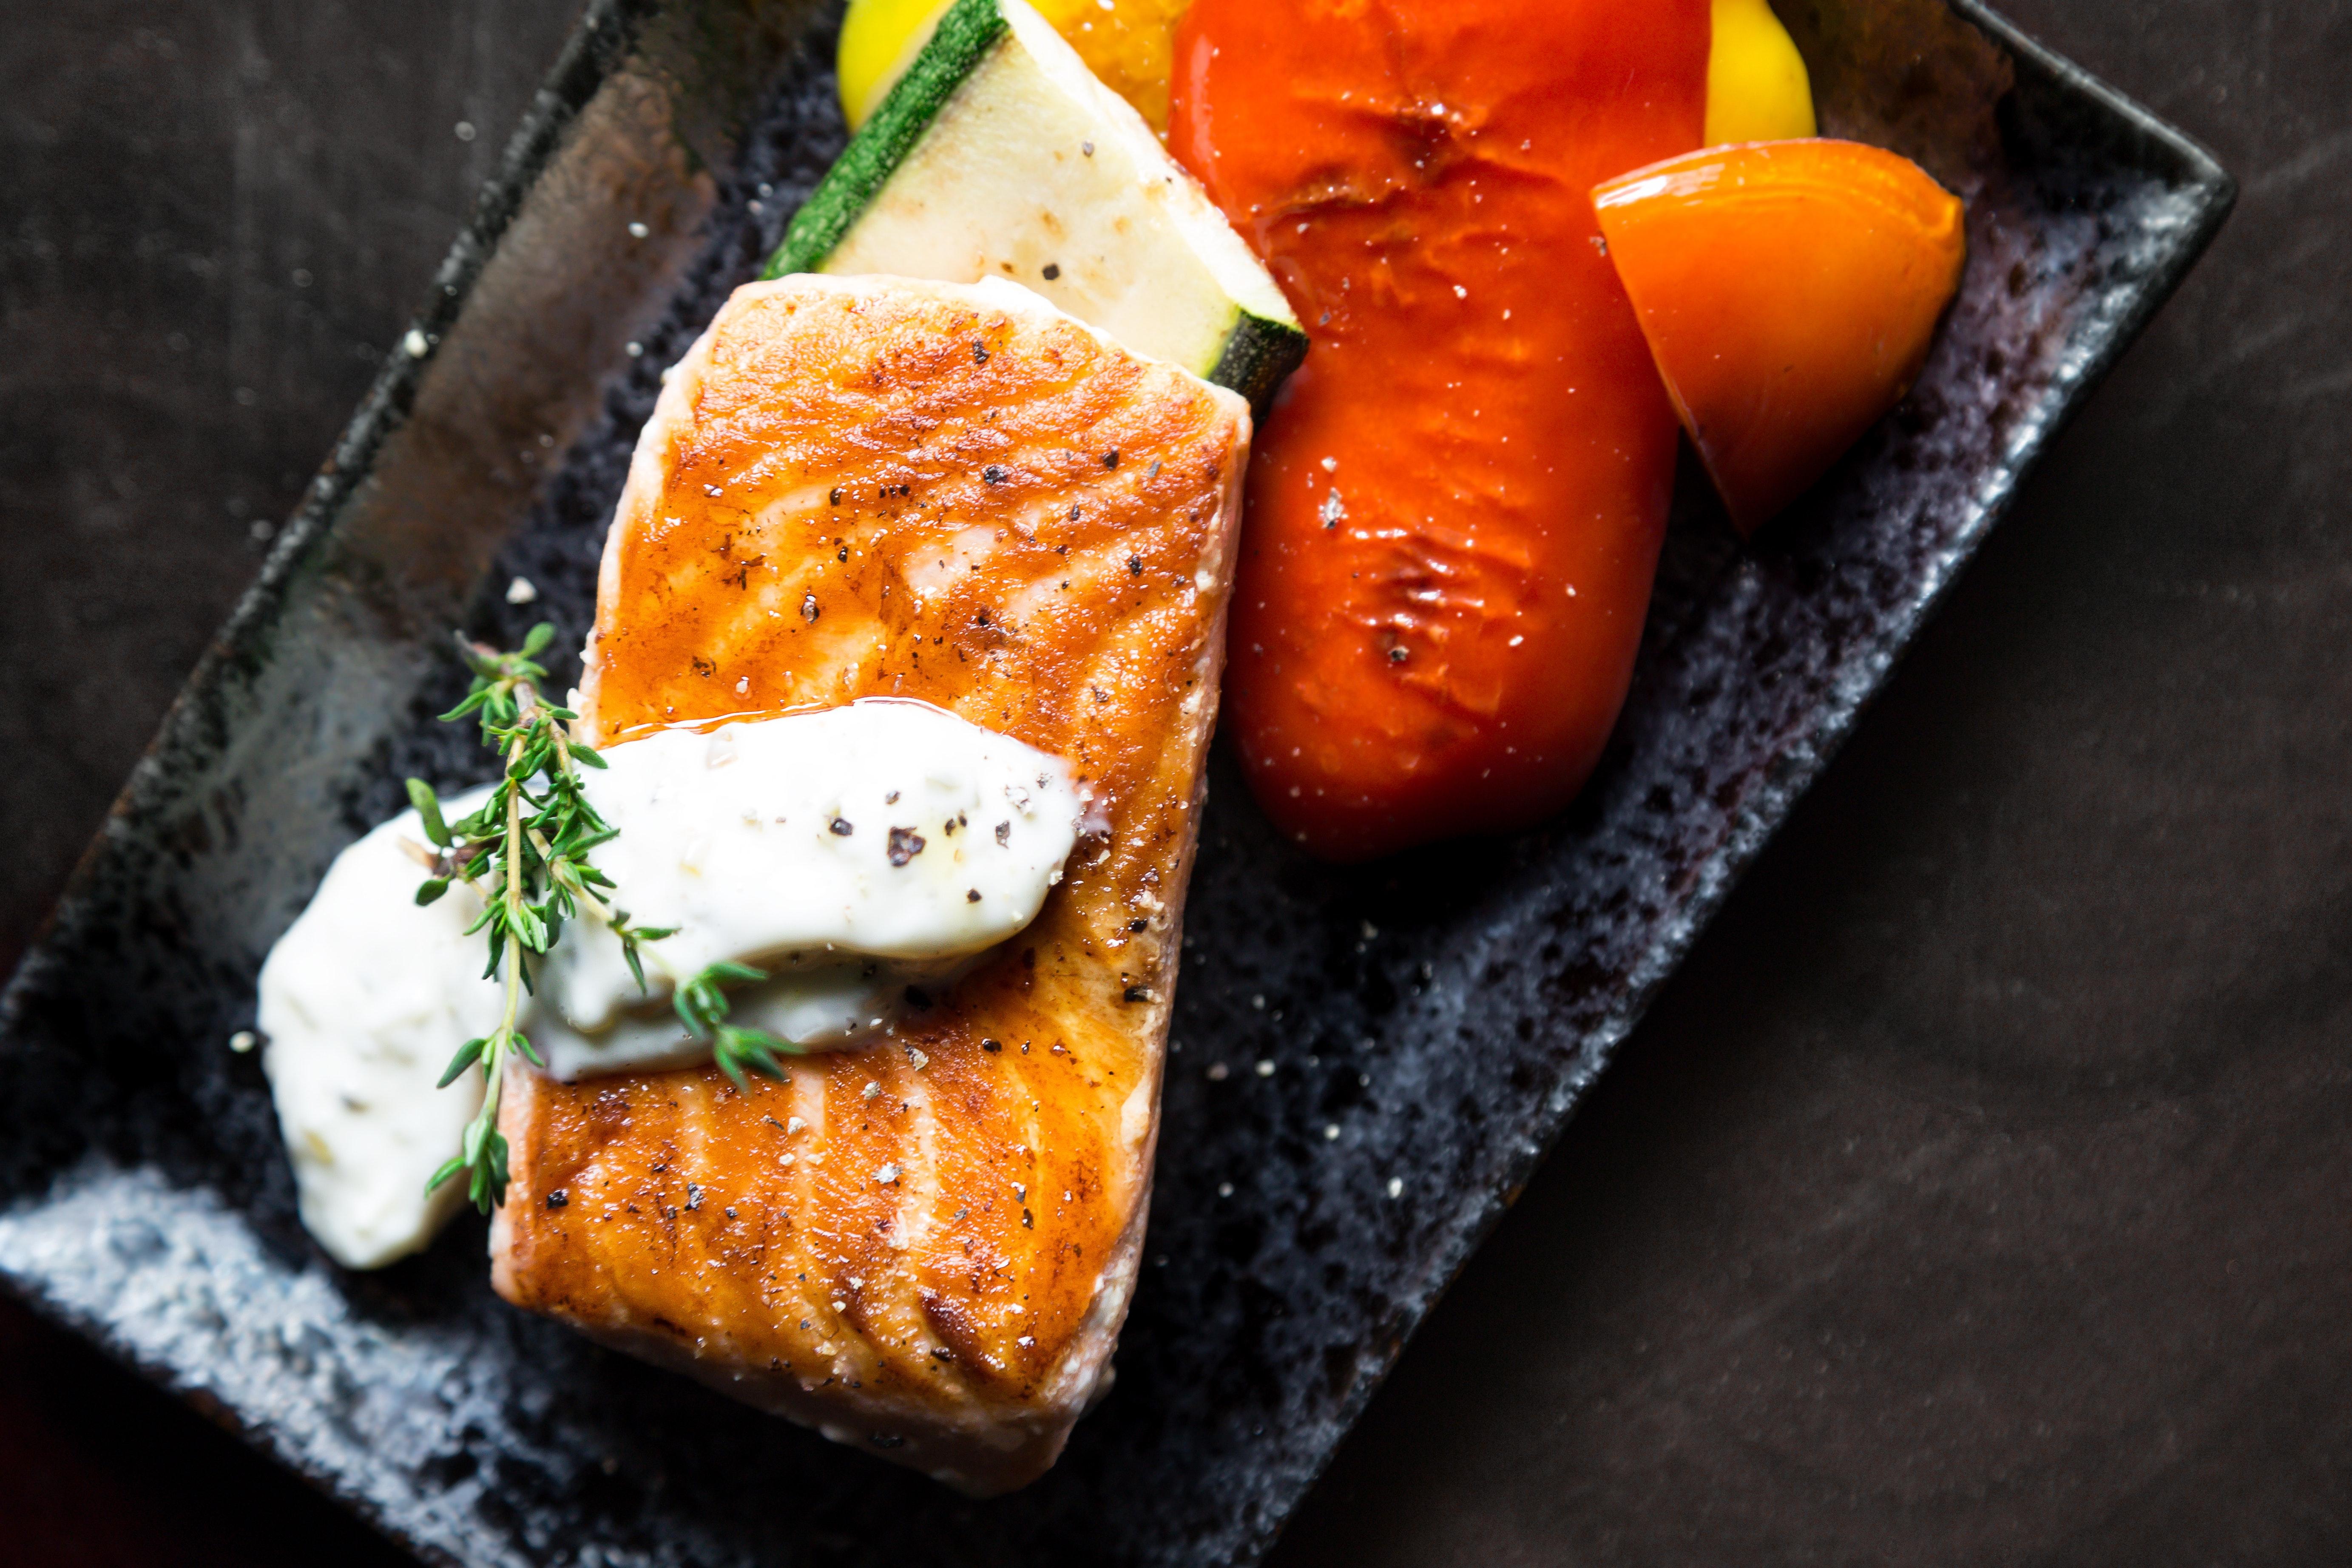 grilled-salmon-fish-on-rectangular-black-ceramic-plate-842142